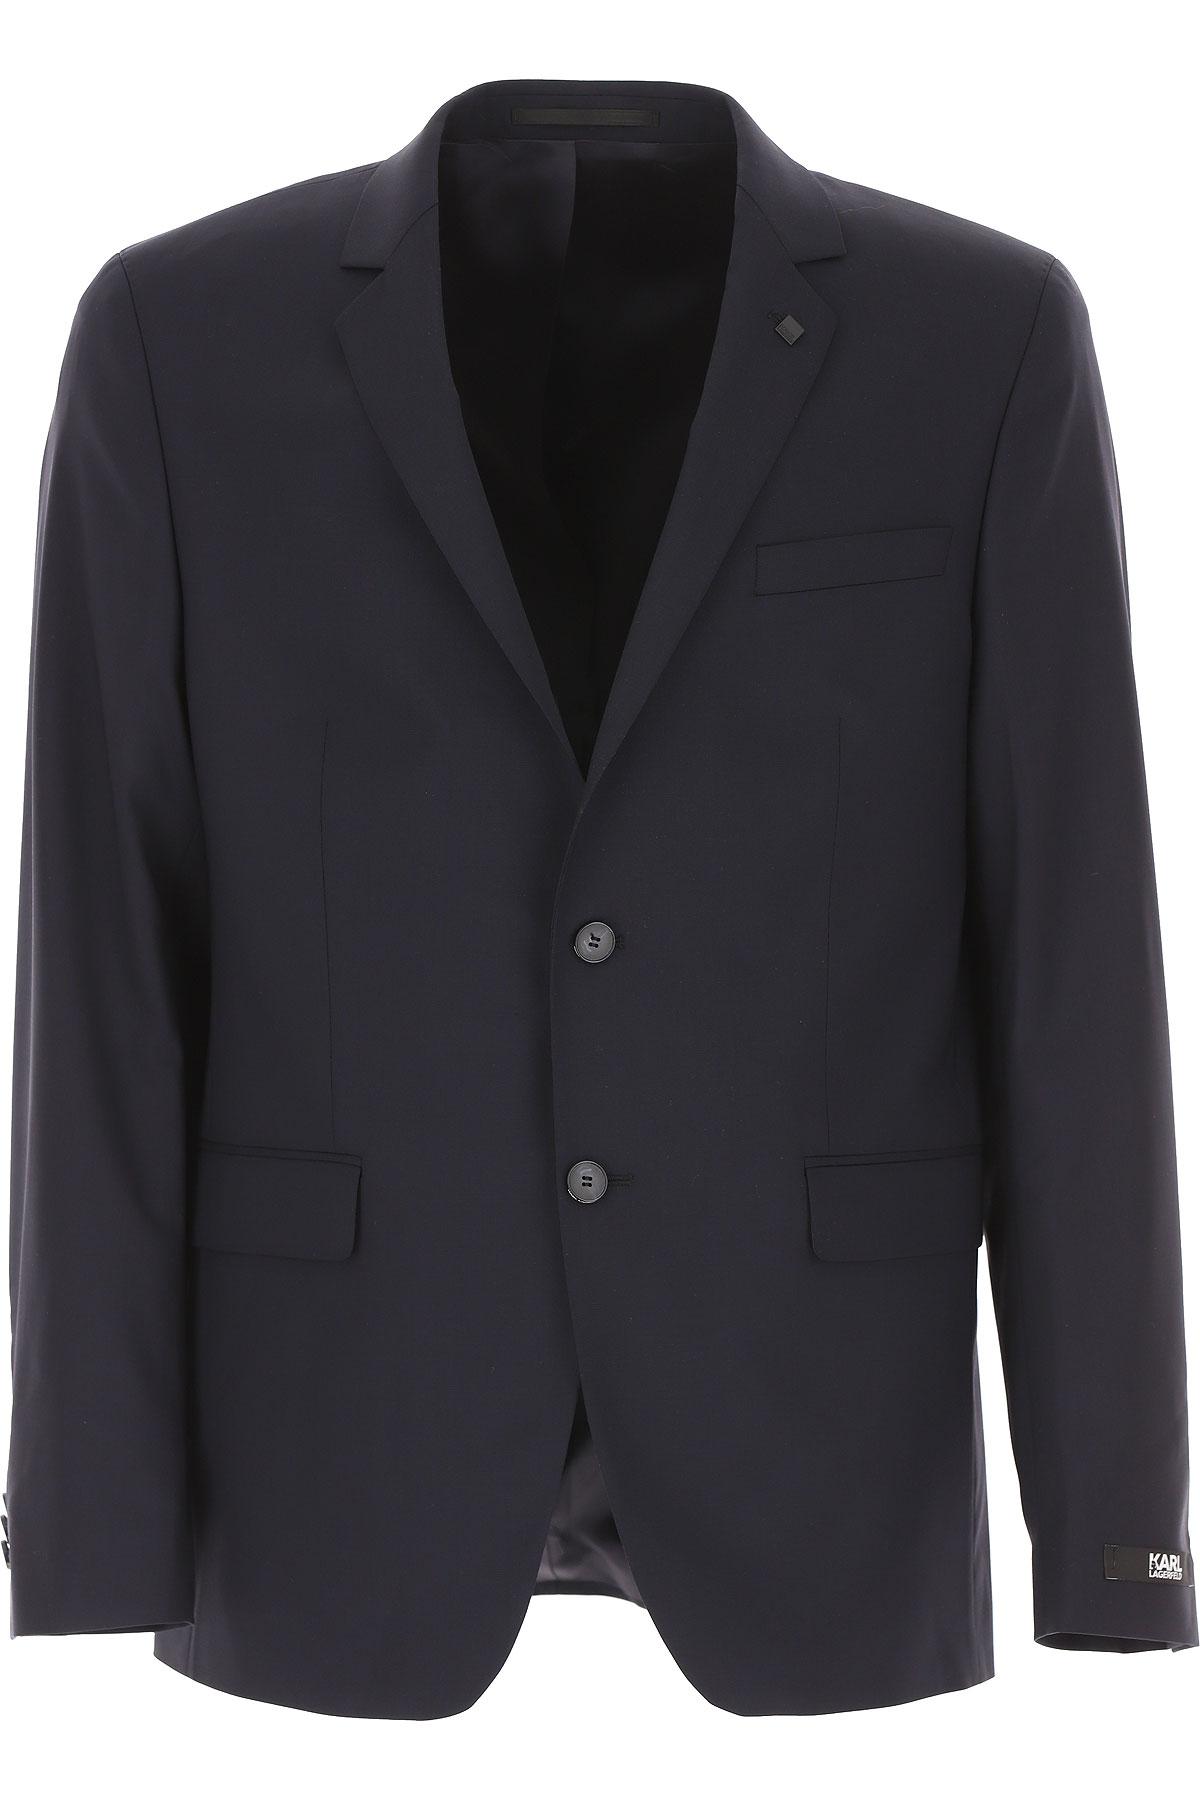 Karl Lagerfeld Blazer for Men, Sport Coat On Sale, Dark Navy Blue, Wool, 2019, 32 34 36 38